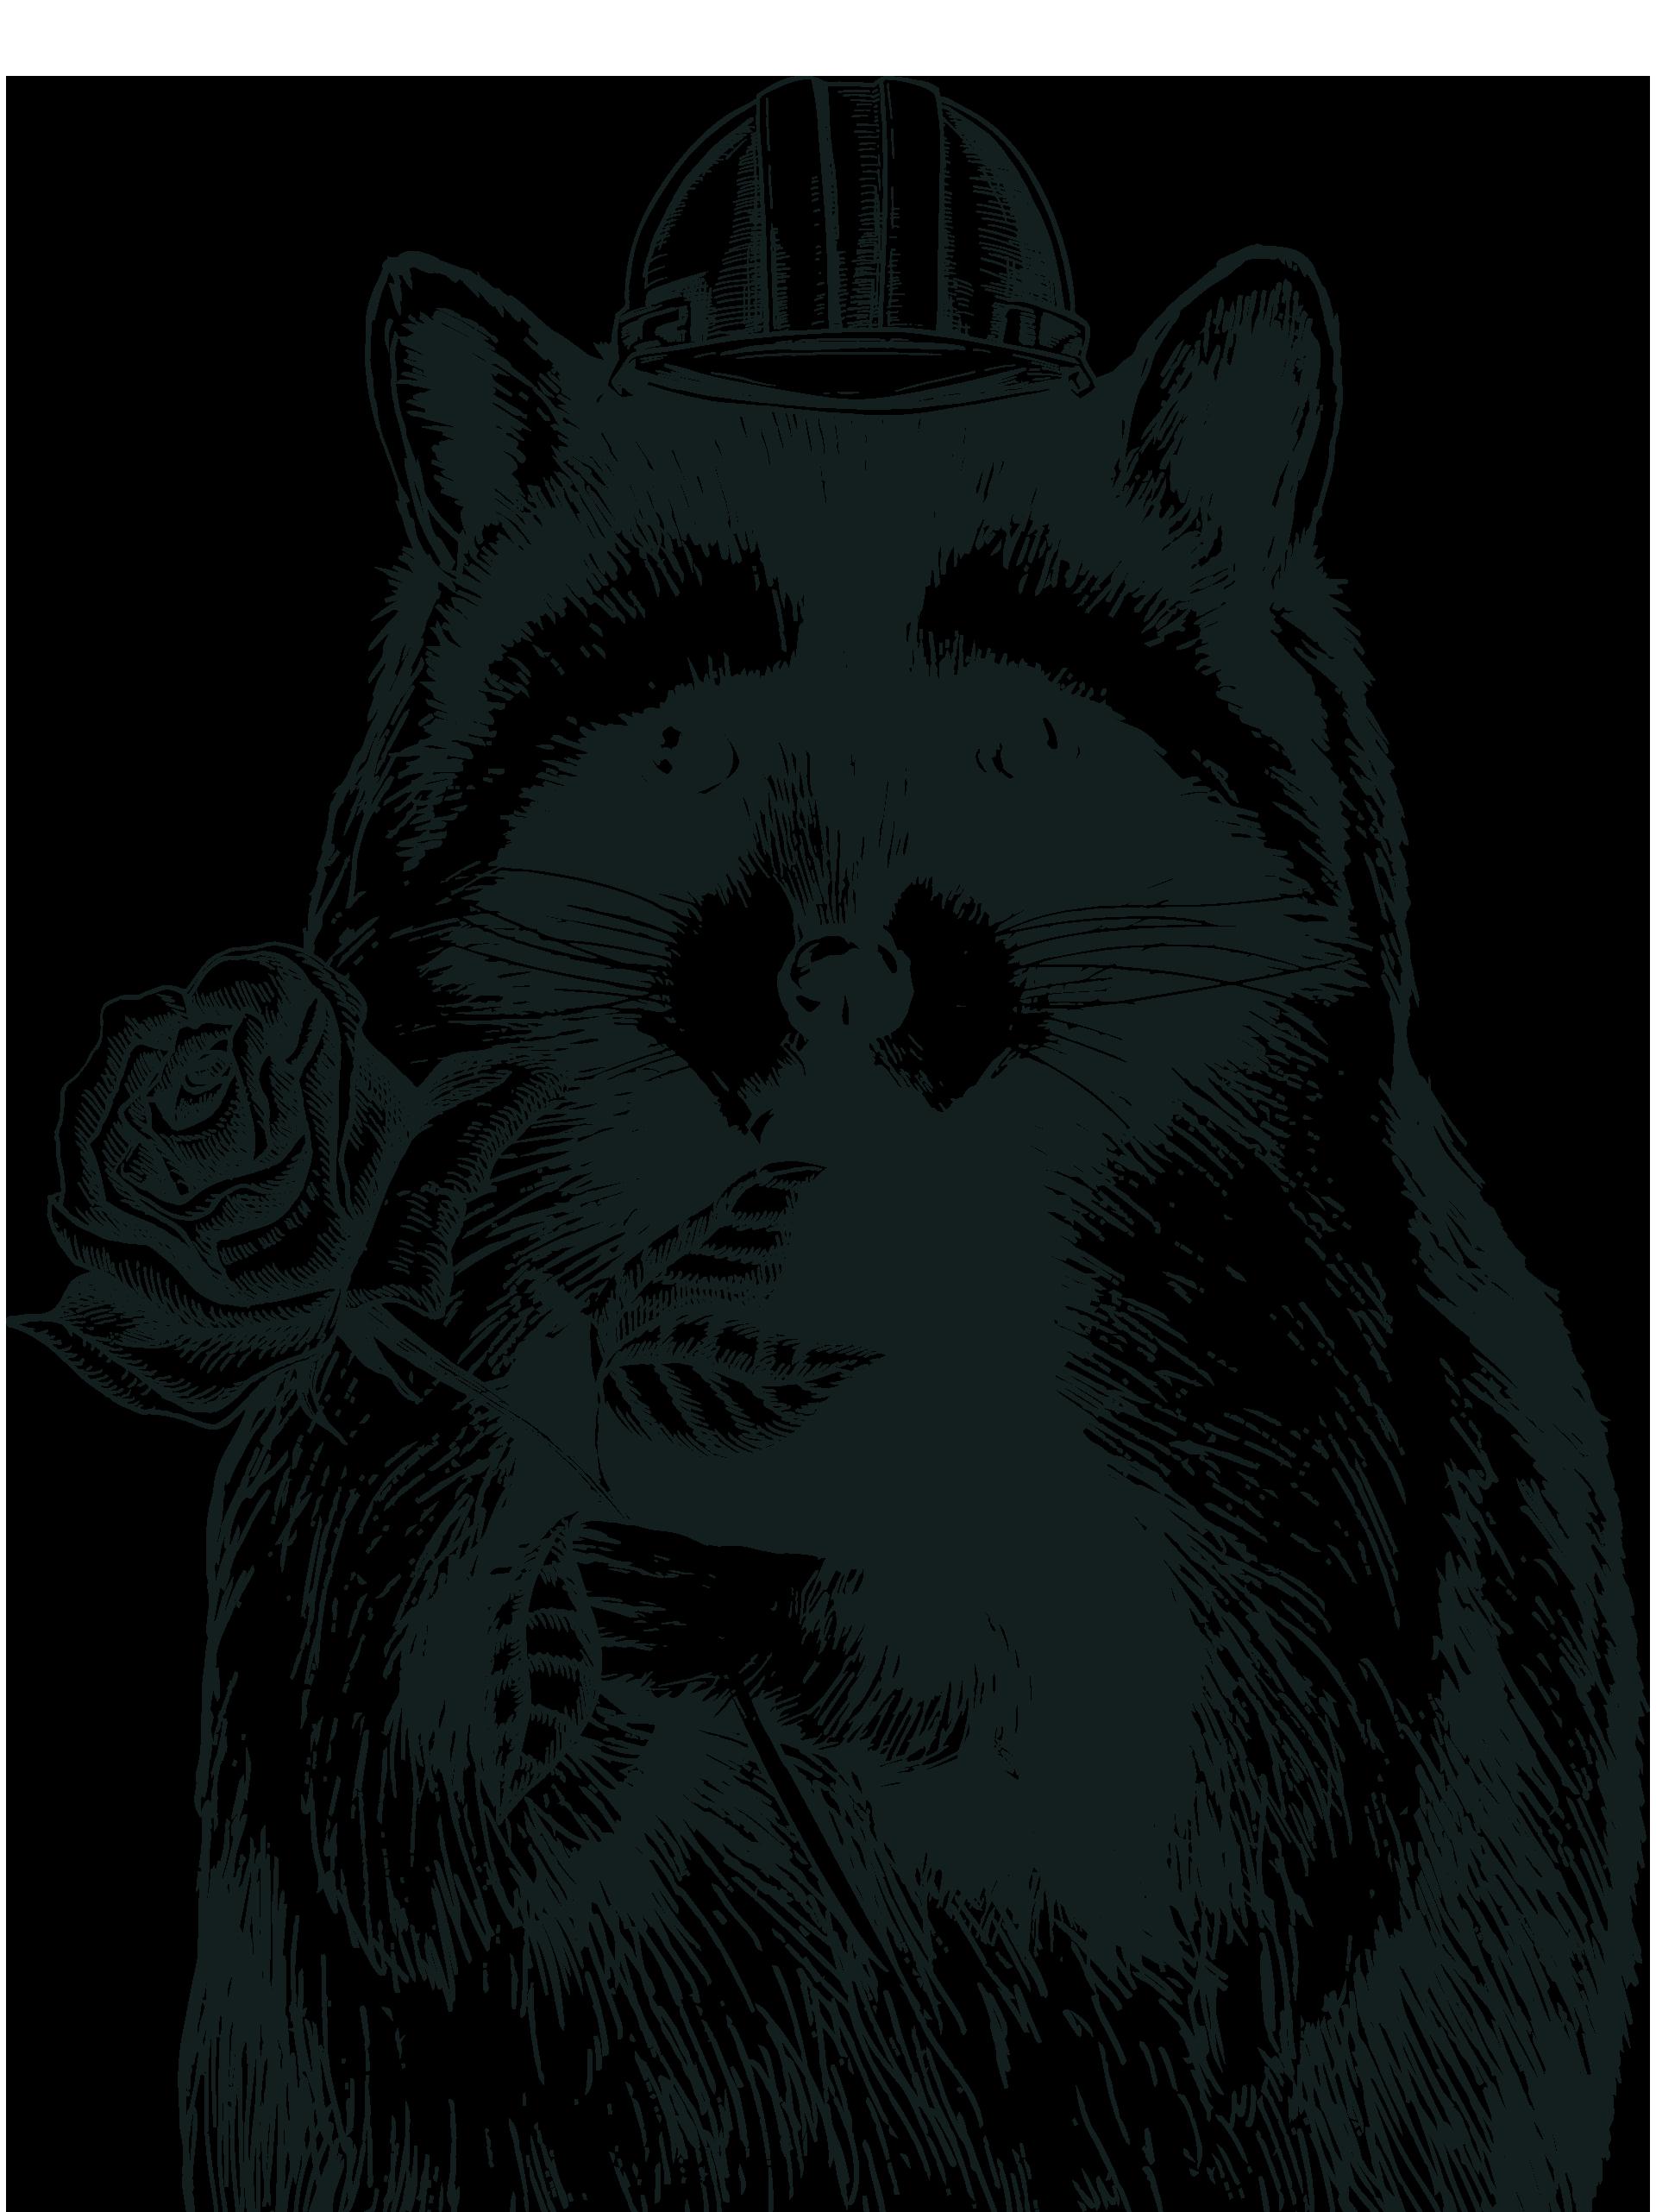 Racoon clipart gray. Denizens brewing co rebrand